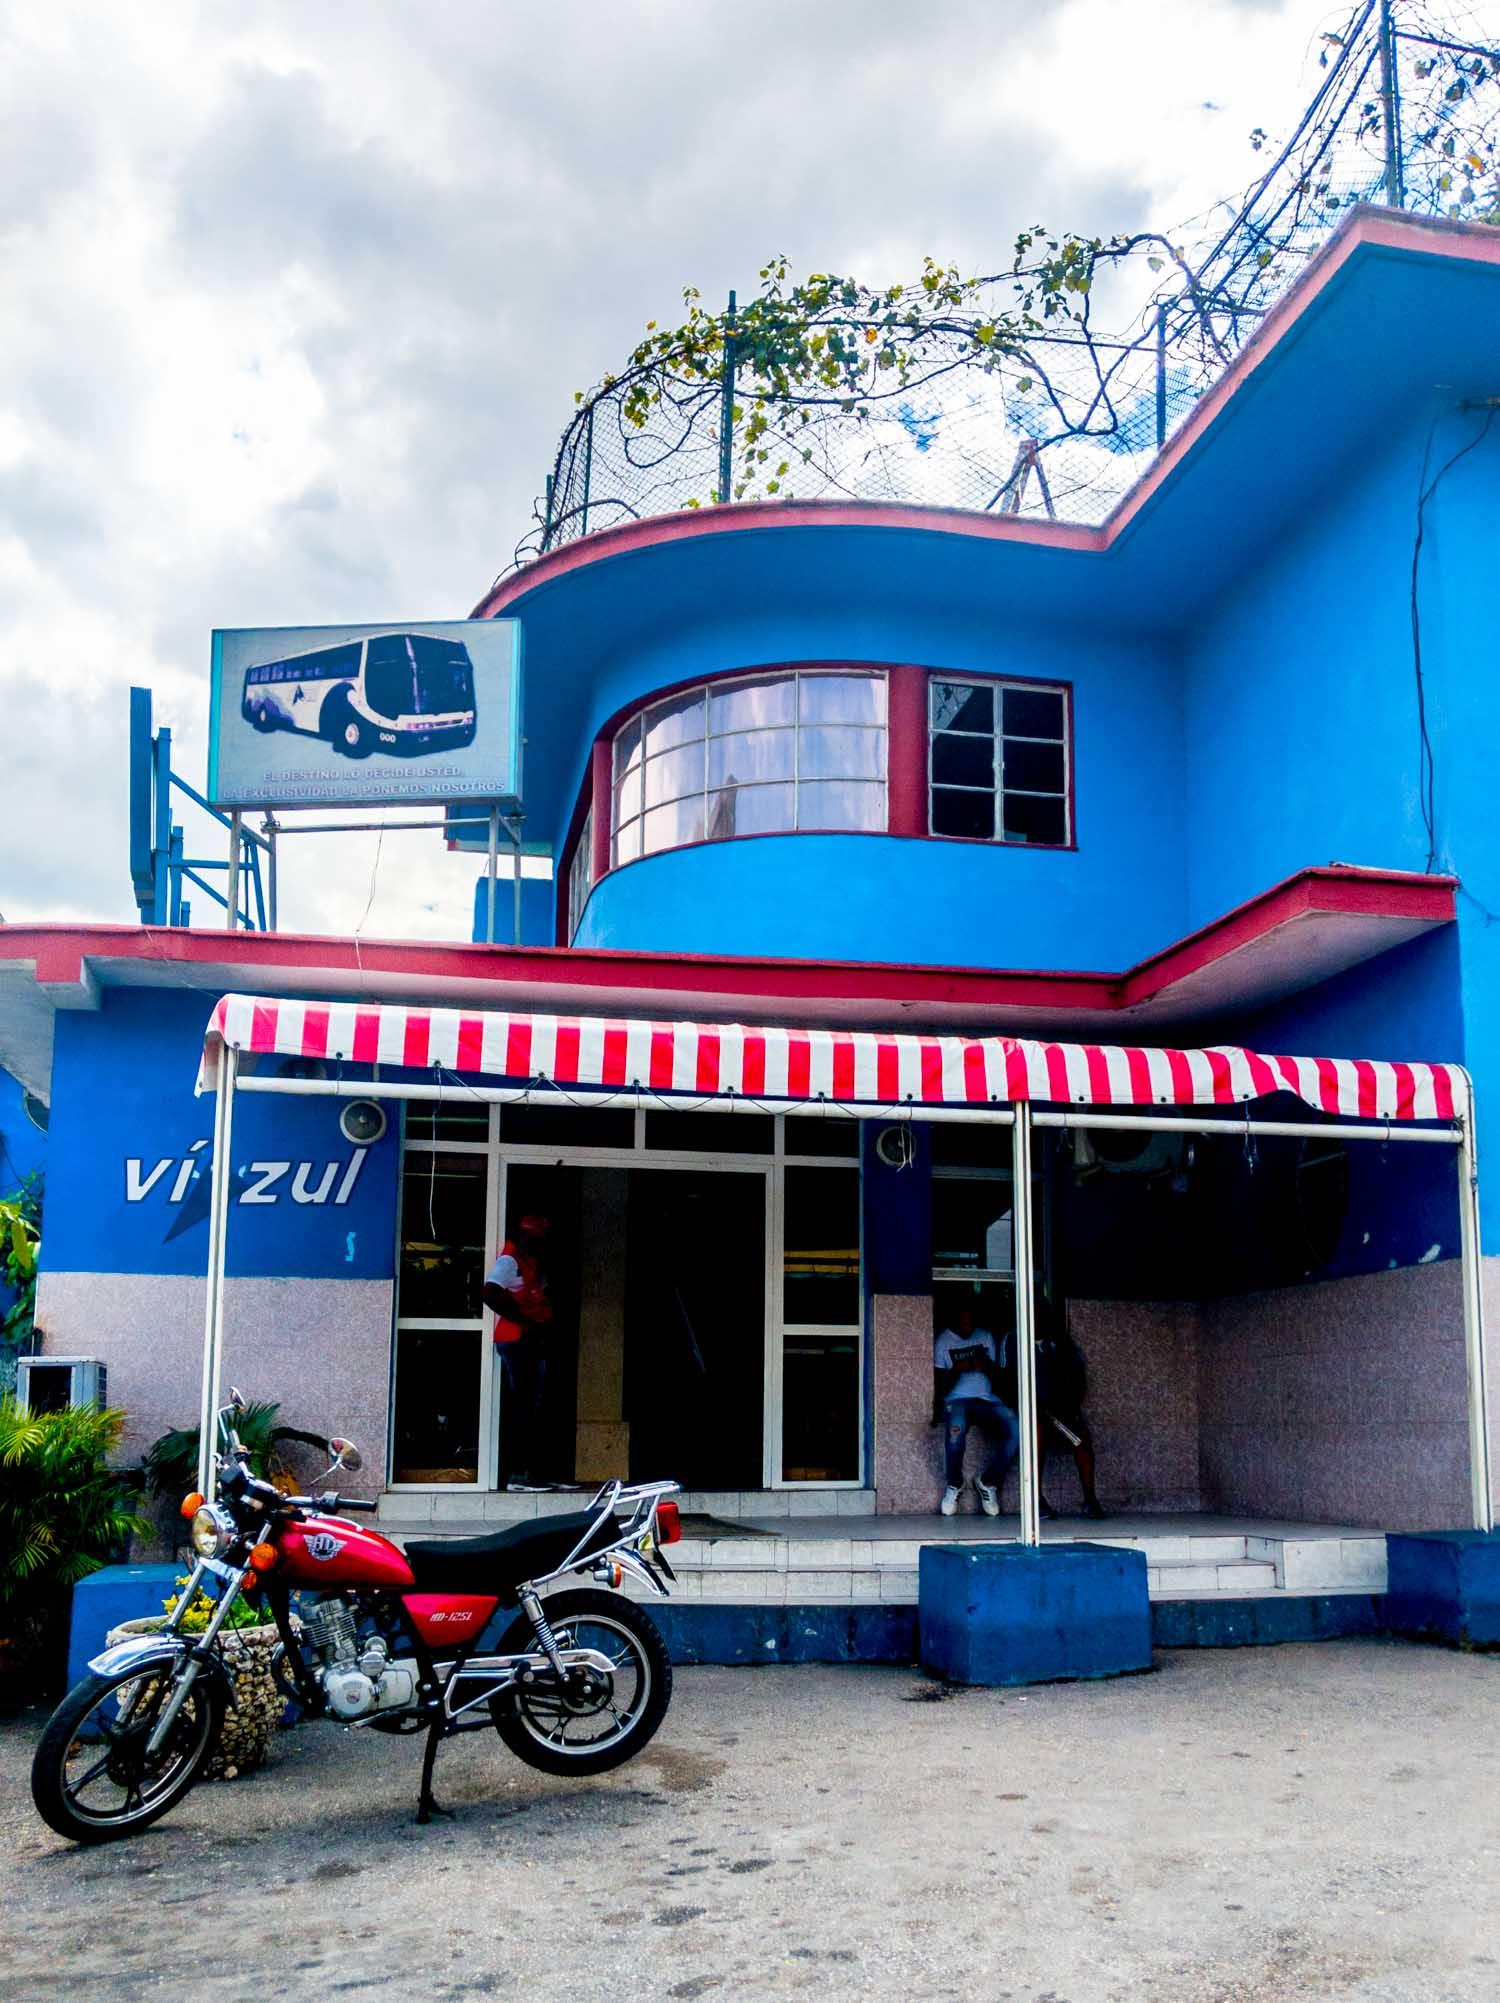 The Viazul bus station in Havana Cuba.